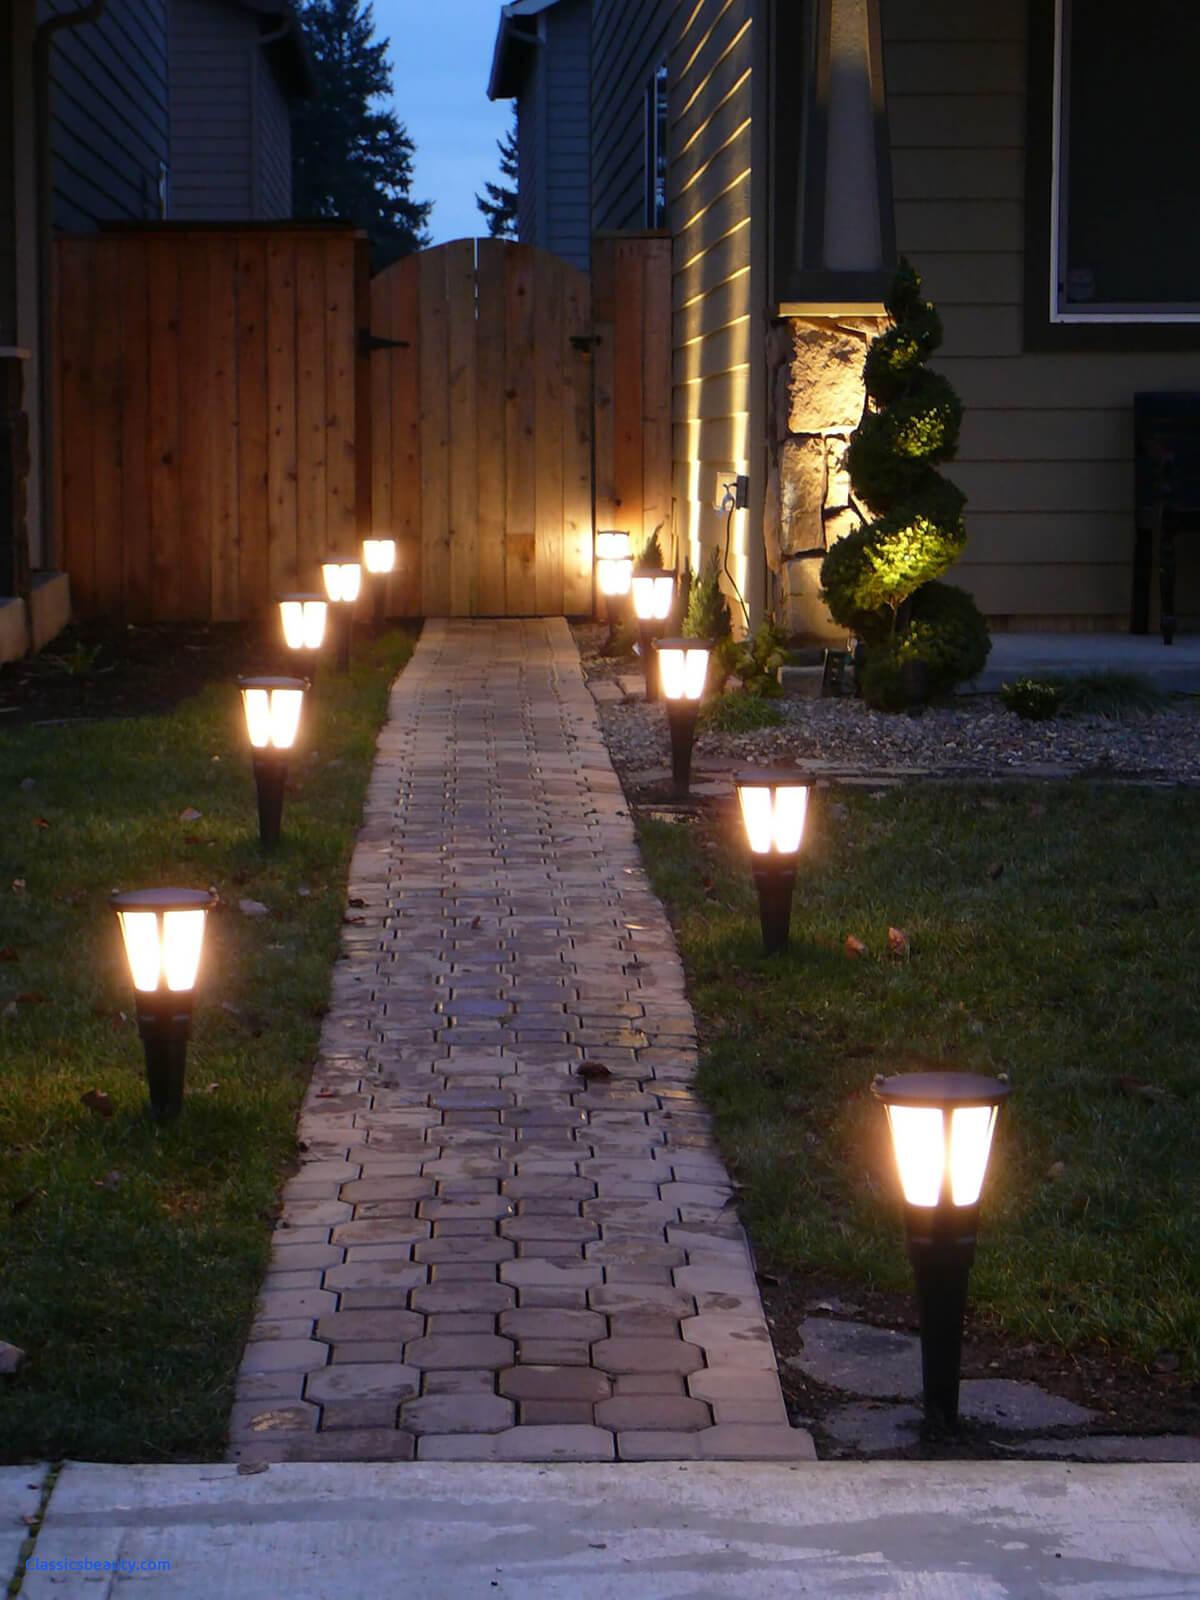 Solar Glowing Lanterns by the Path